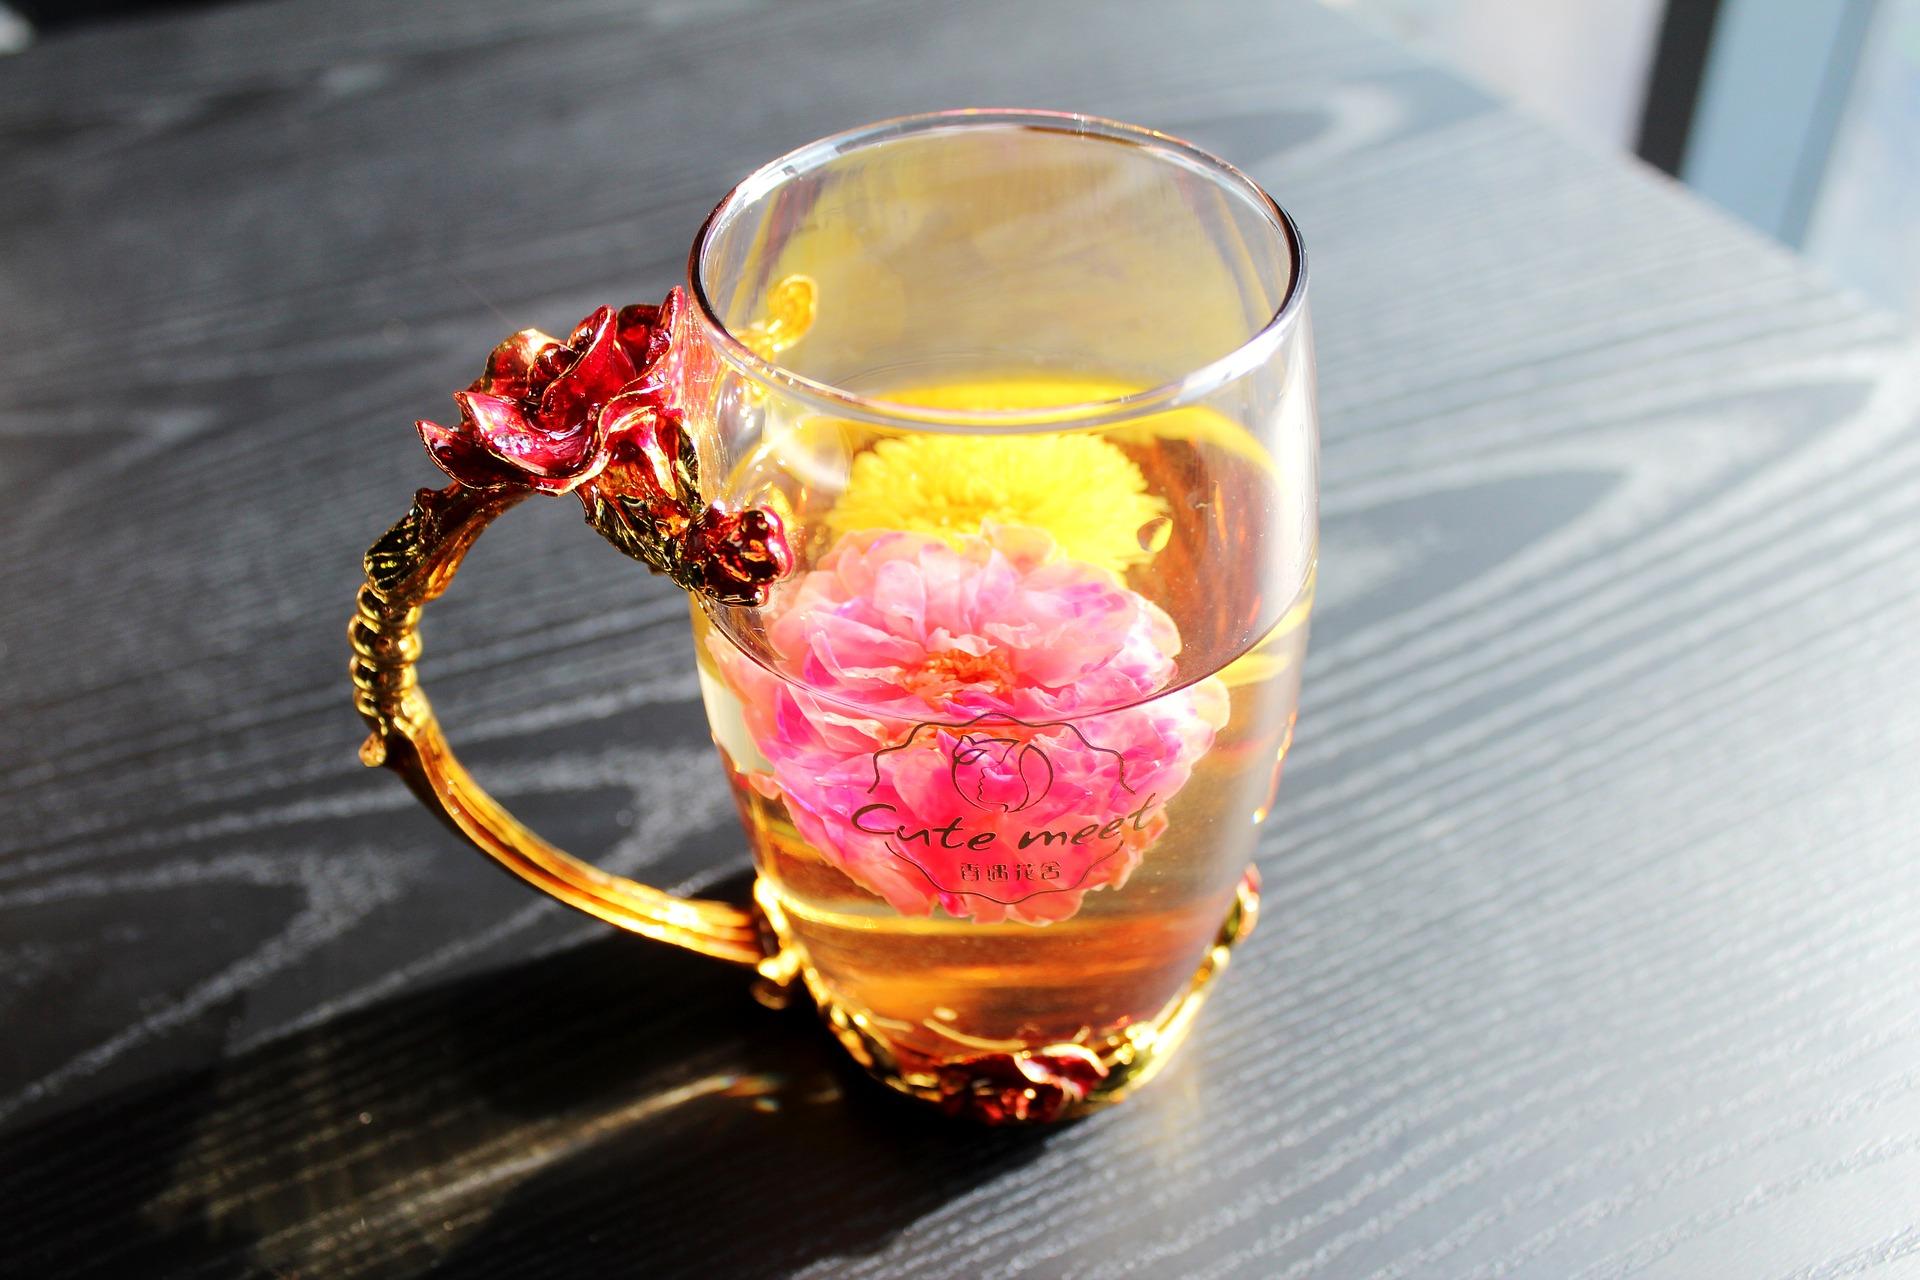 tea-rose-corolla-1871835_1920.jpg